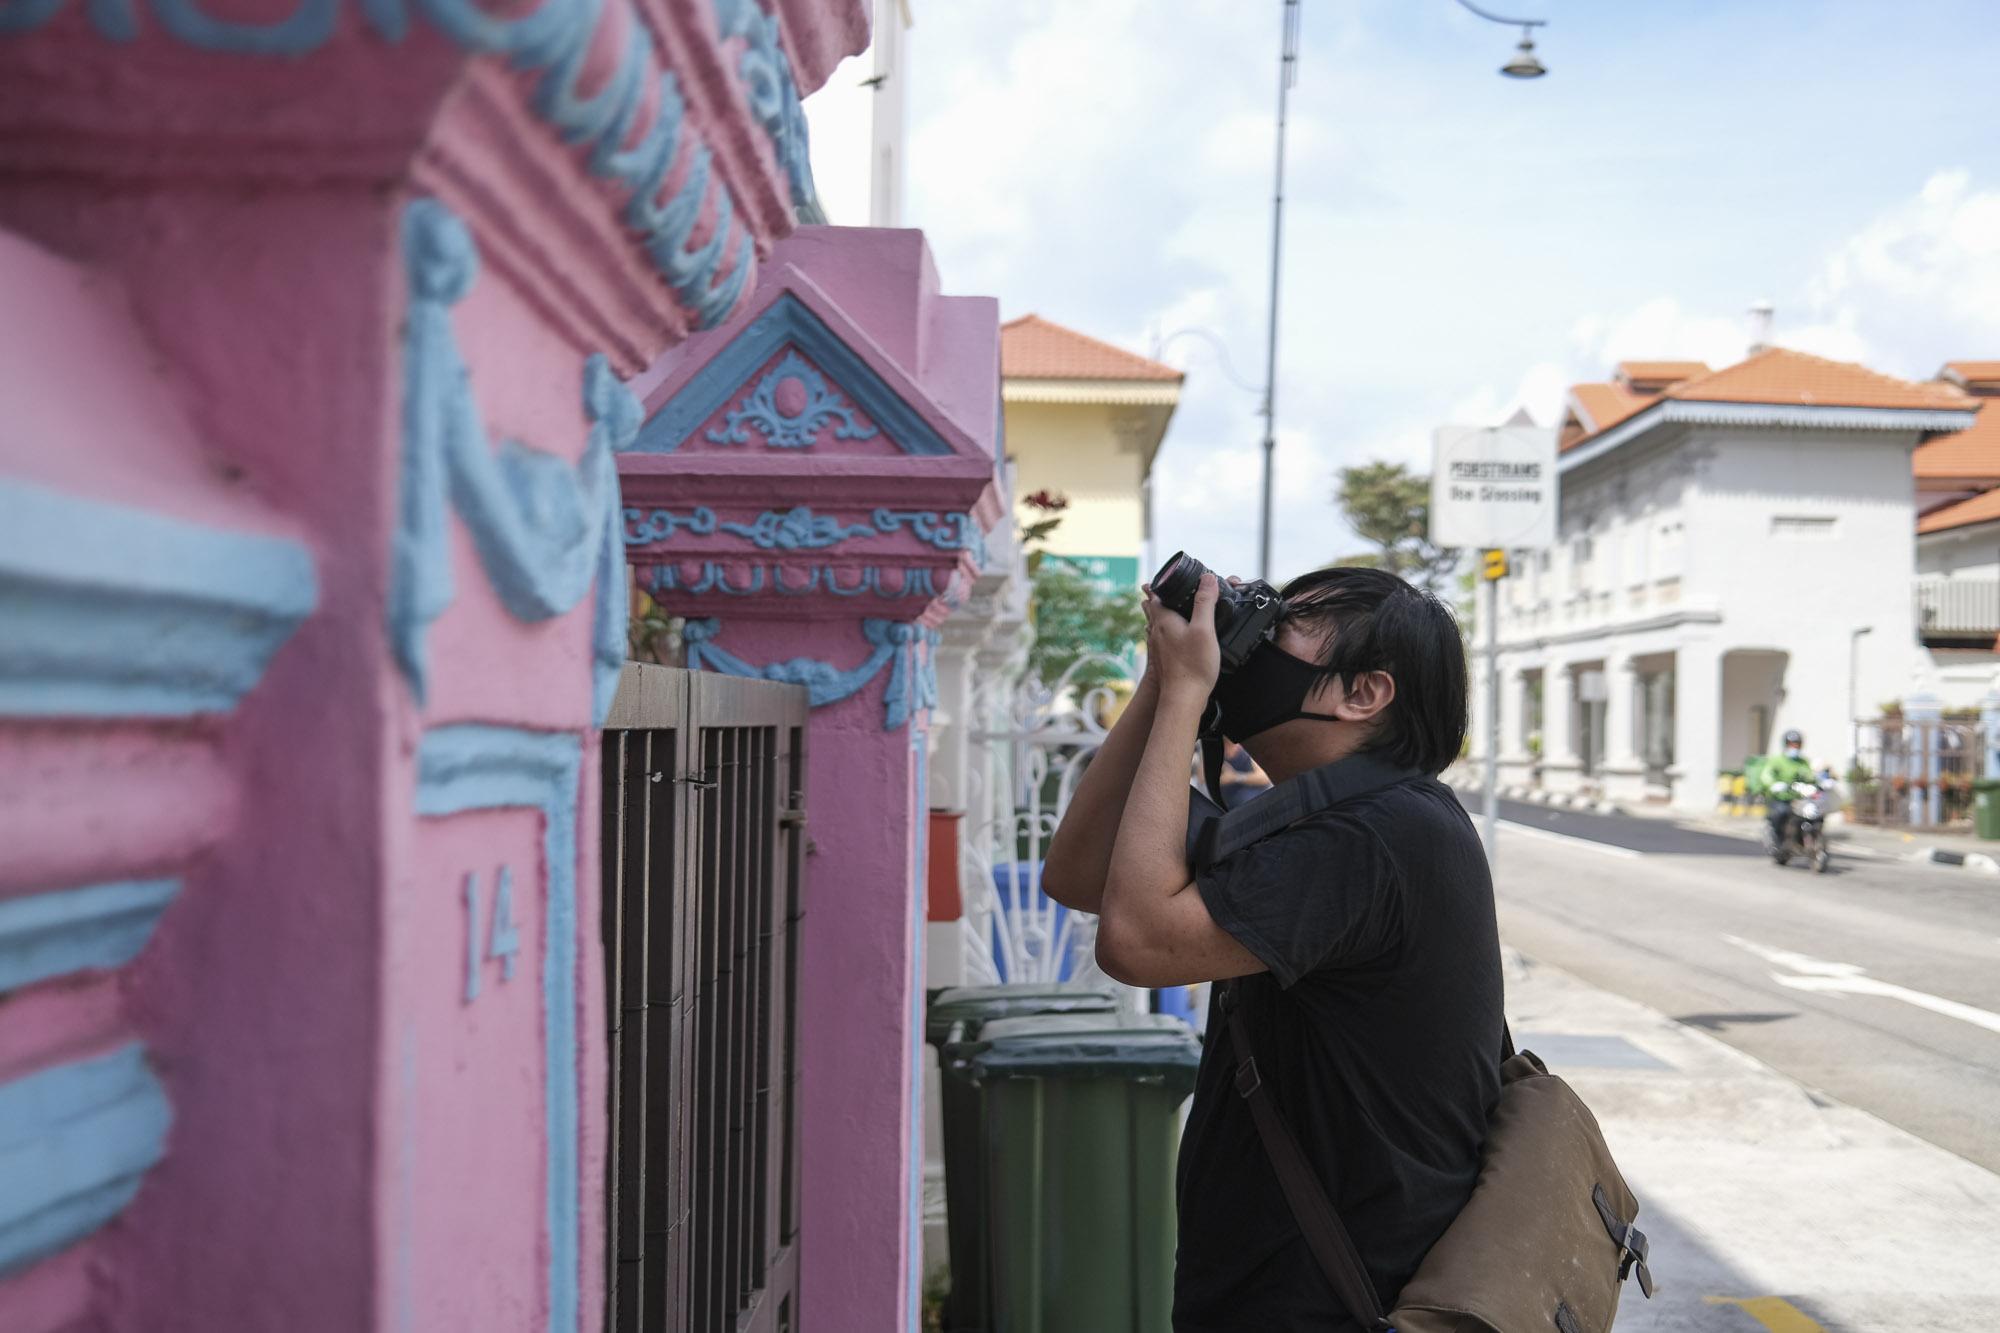 Photowalk with FUJIFILM Photography Workshop Shophouse Singapore COCO Creative Studio 3